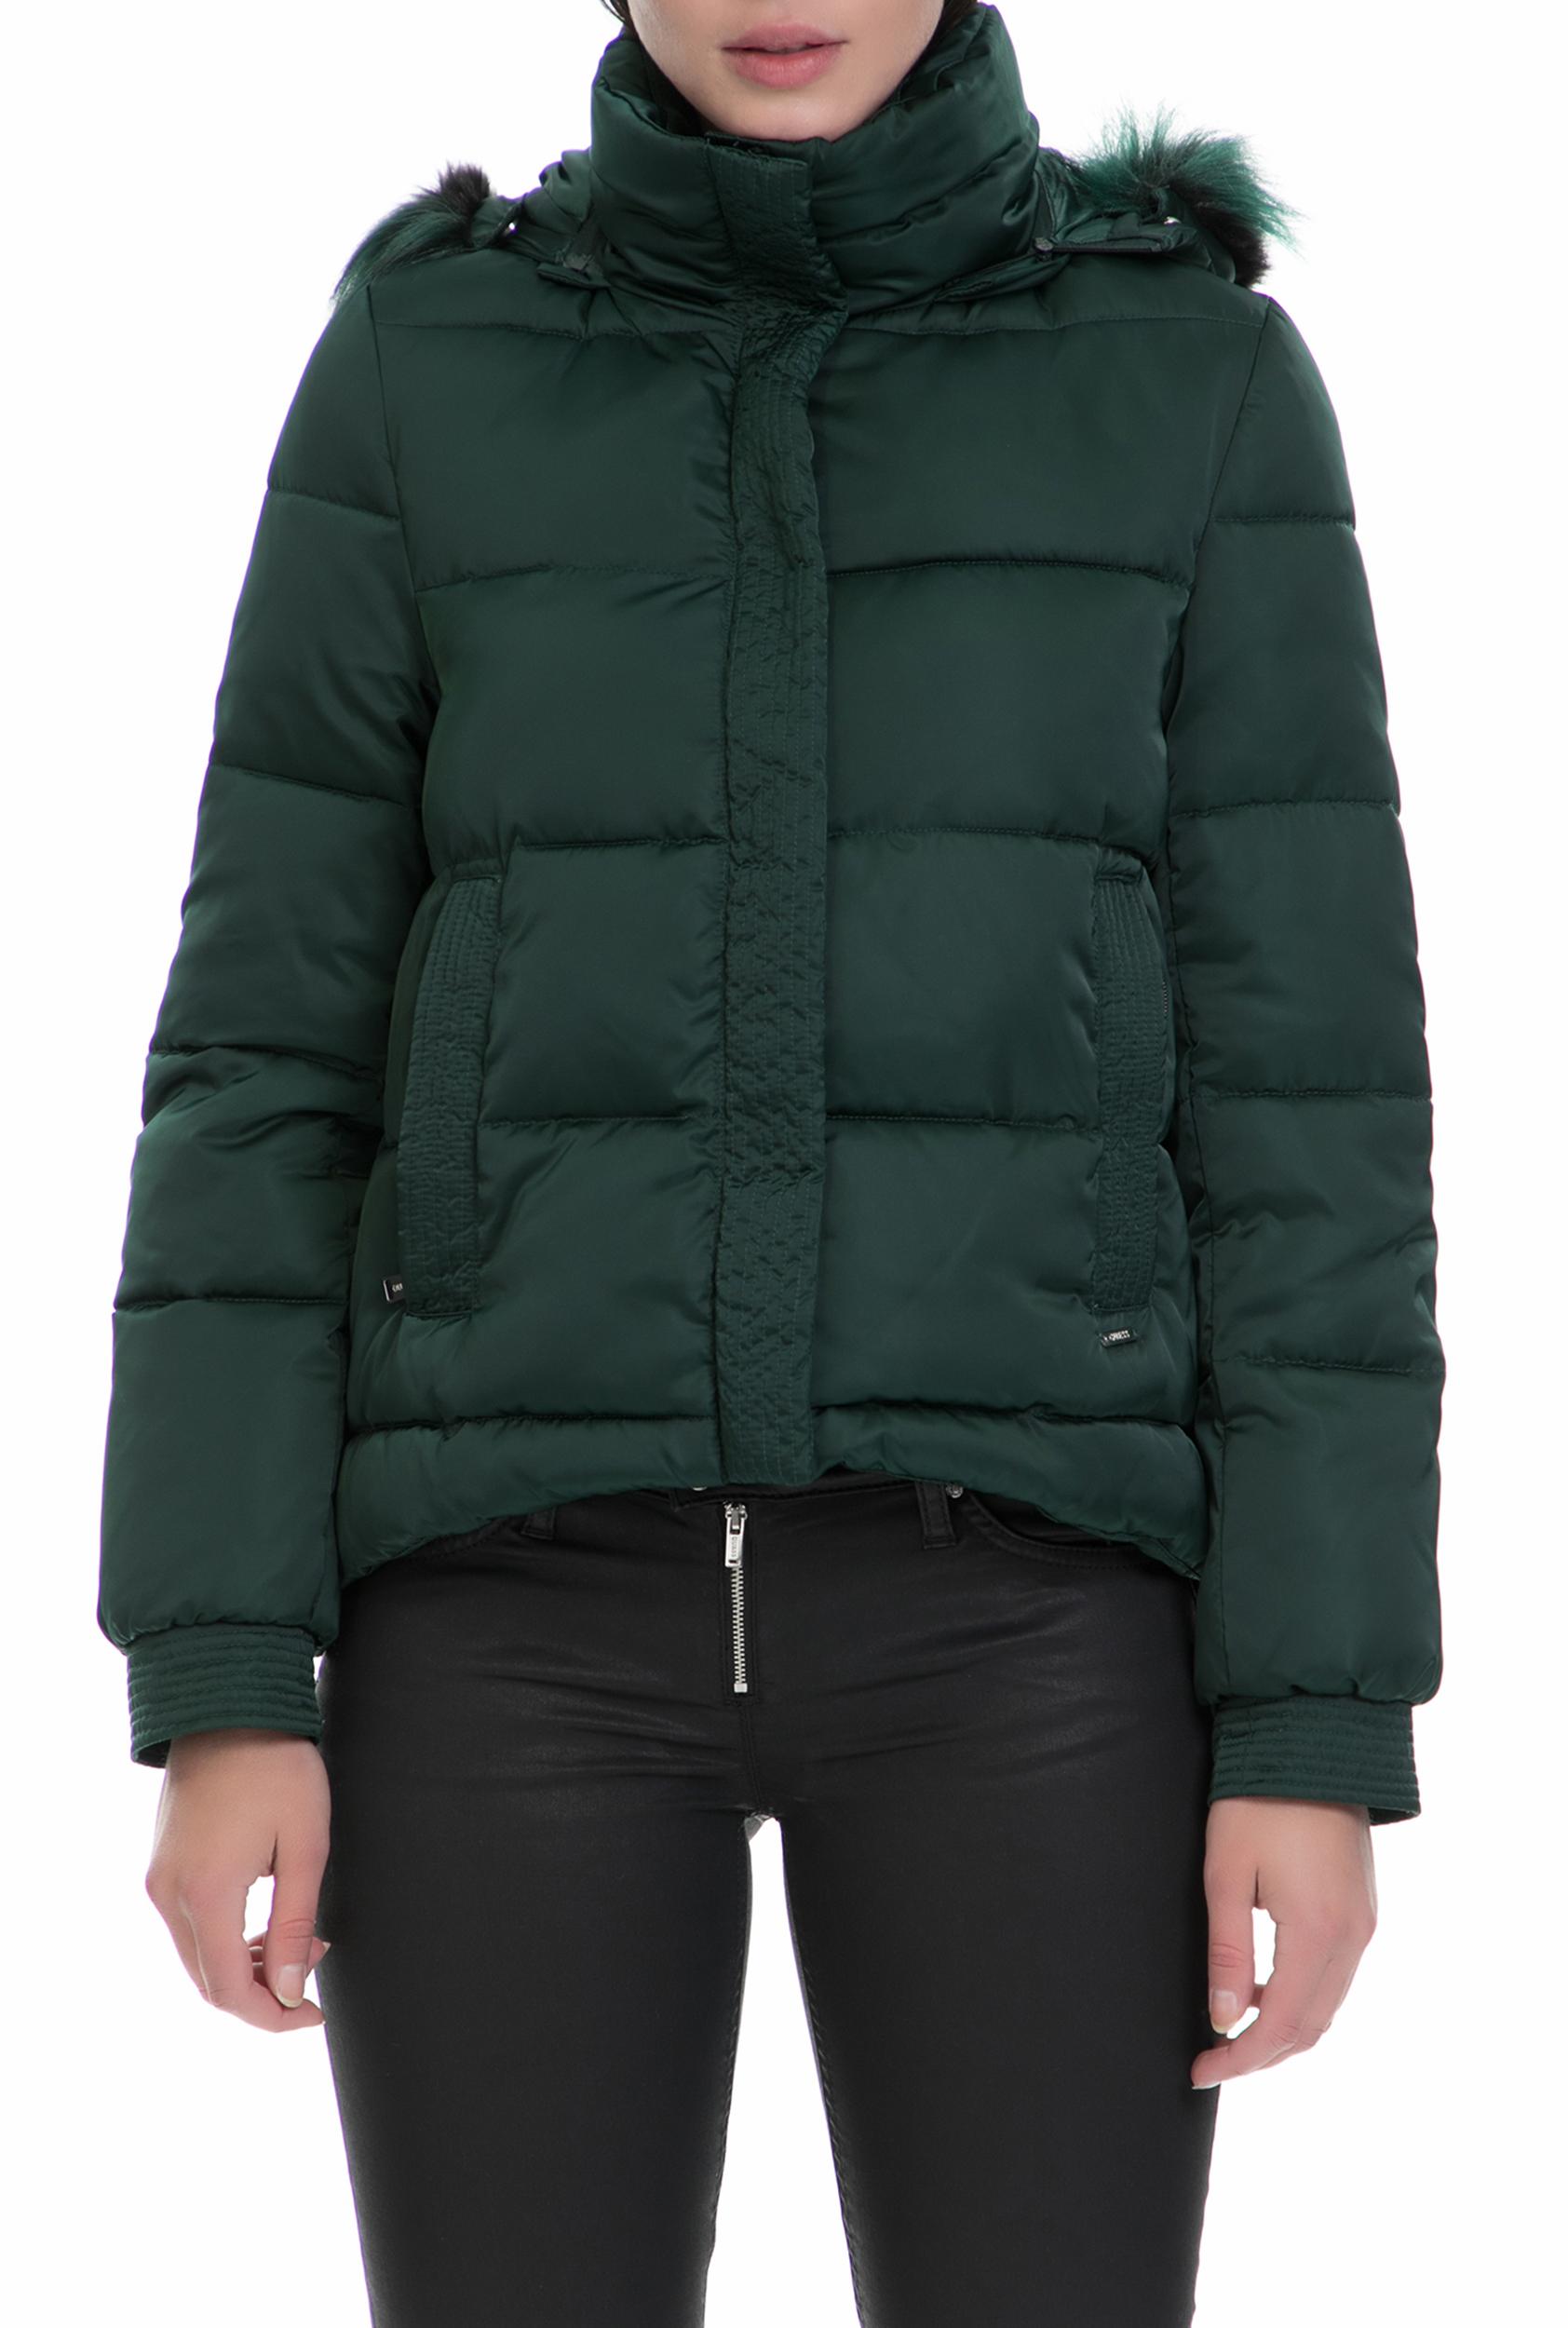 GUESS - Γυναικείο φουσκωτό μπουφάν Guess σκούρο πράσινο γυναικεία ρούχα πανωφόρια μπουφάν